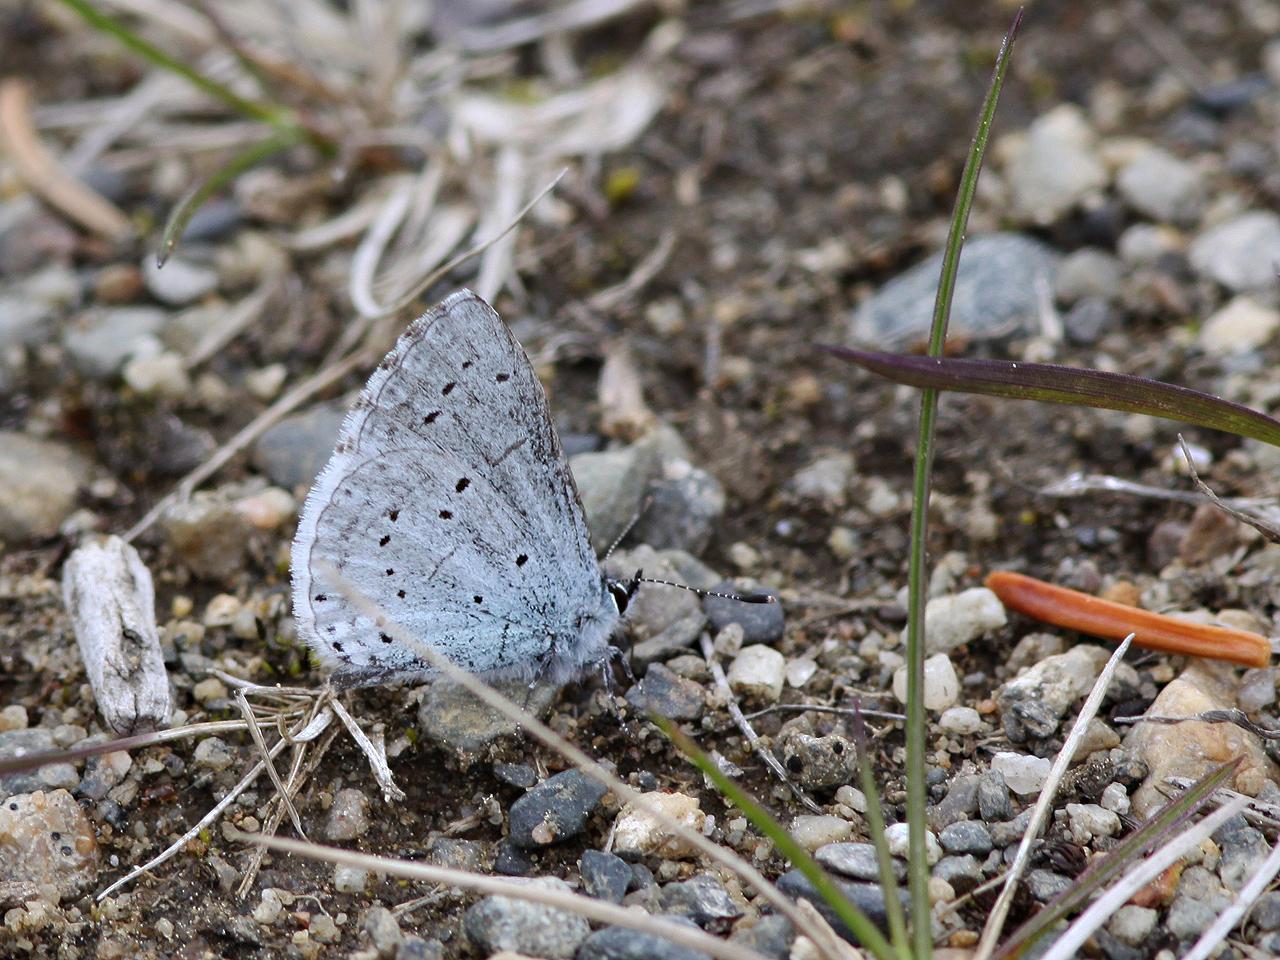 Tosteblåvinge Celastrina argiolus Holly Blue Sorsele, Lycksele Lappmark